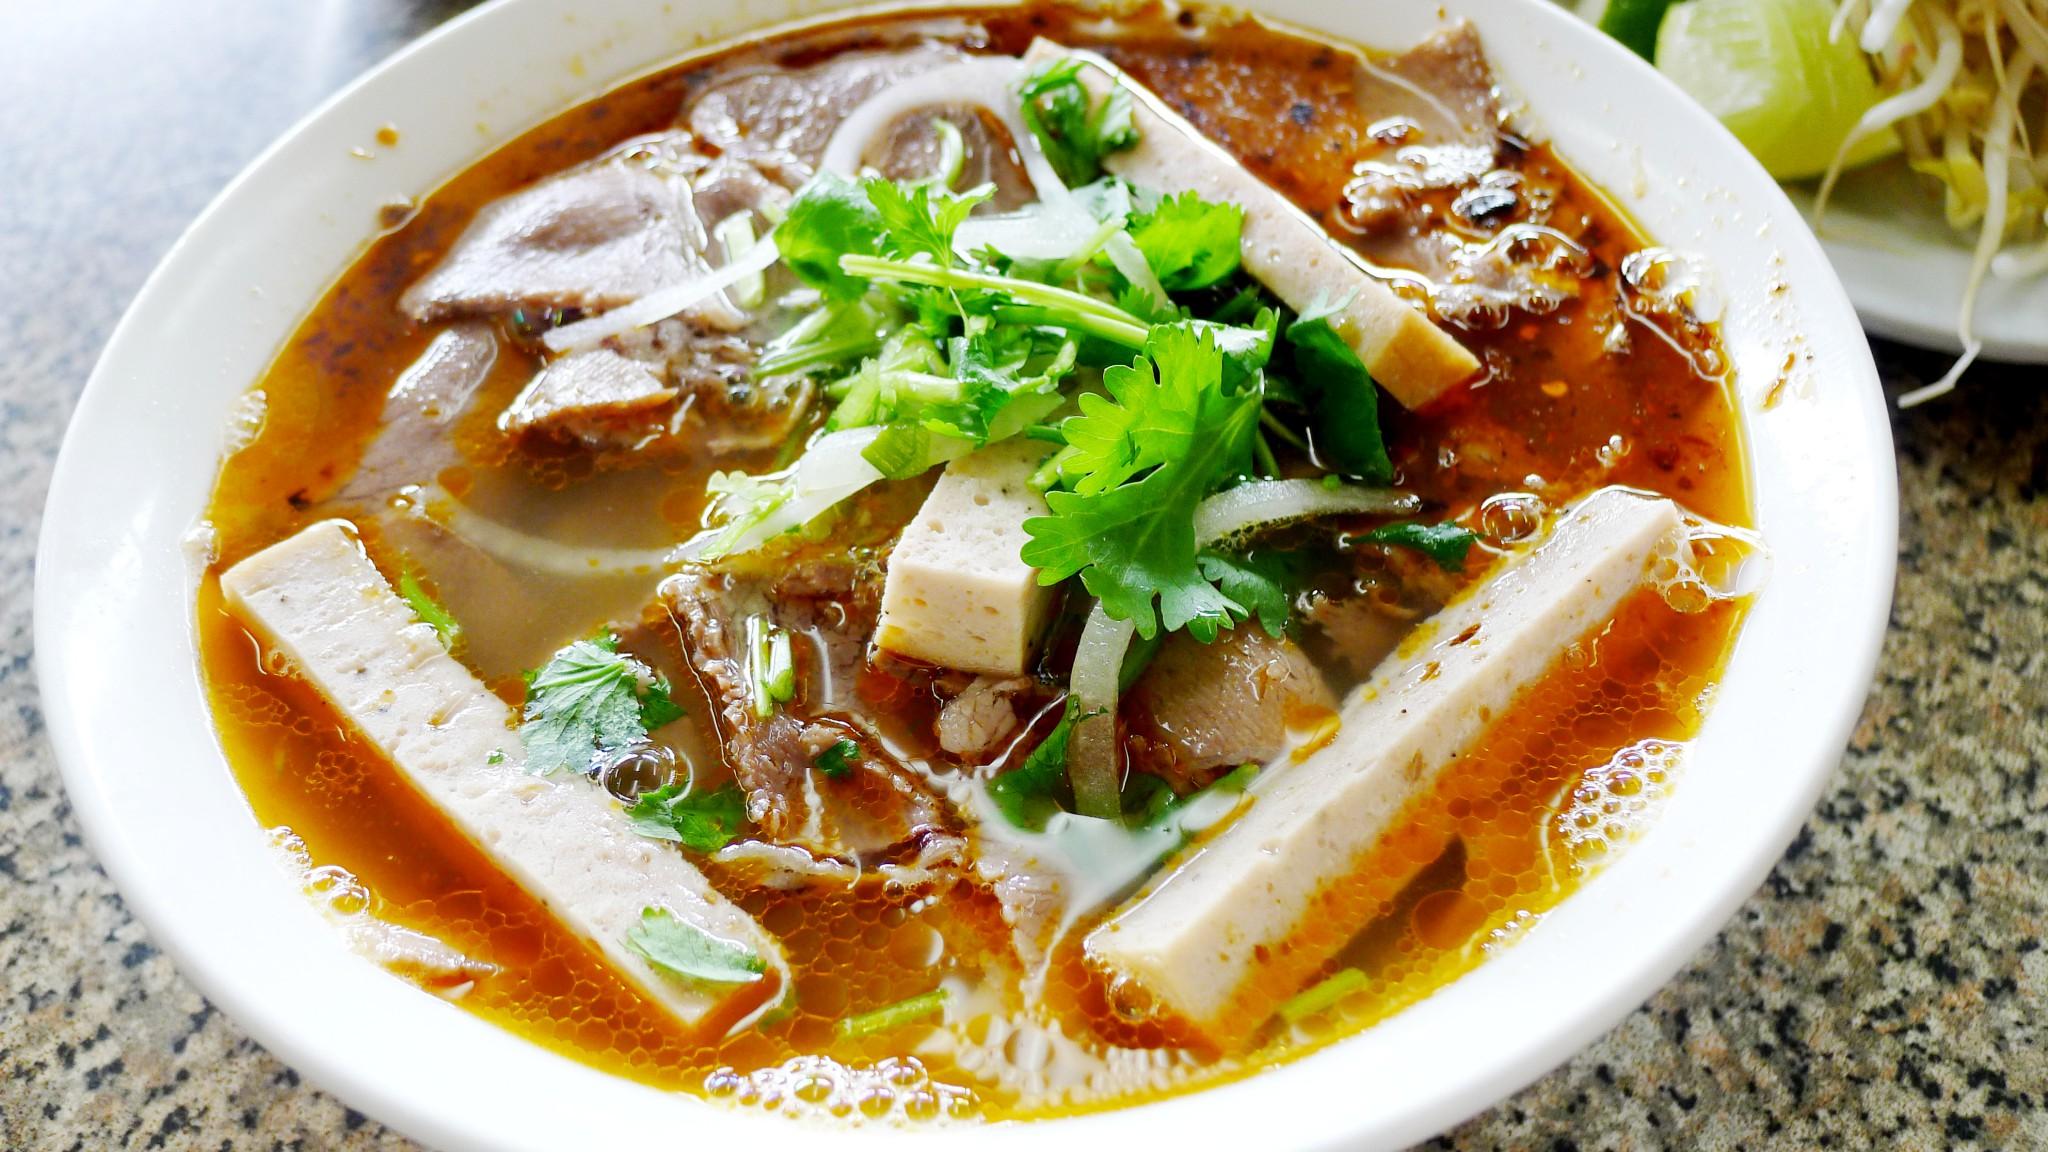 Bao Chao Pho Vietnamese Restaurant Vancouver Nomss.com instanomss